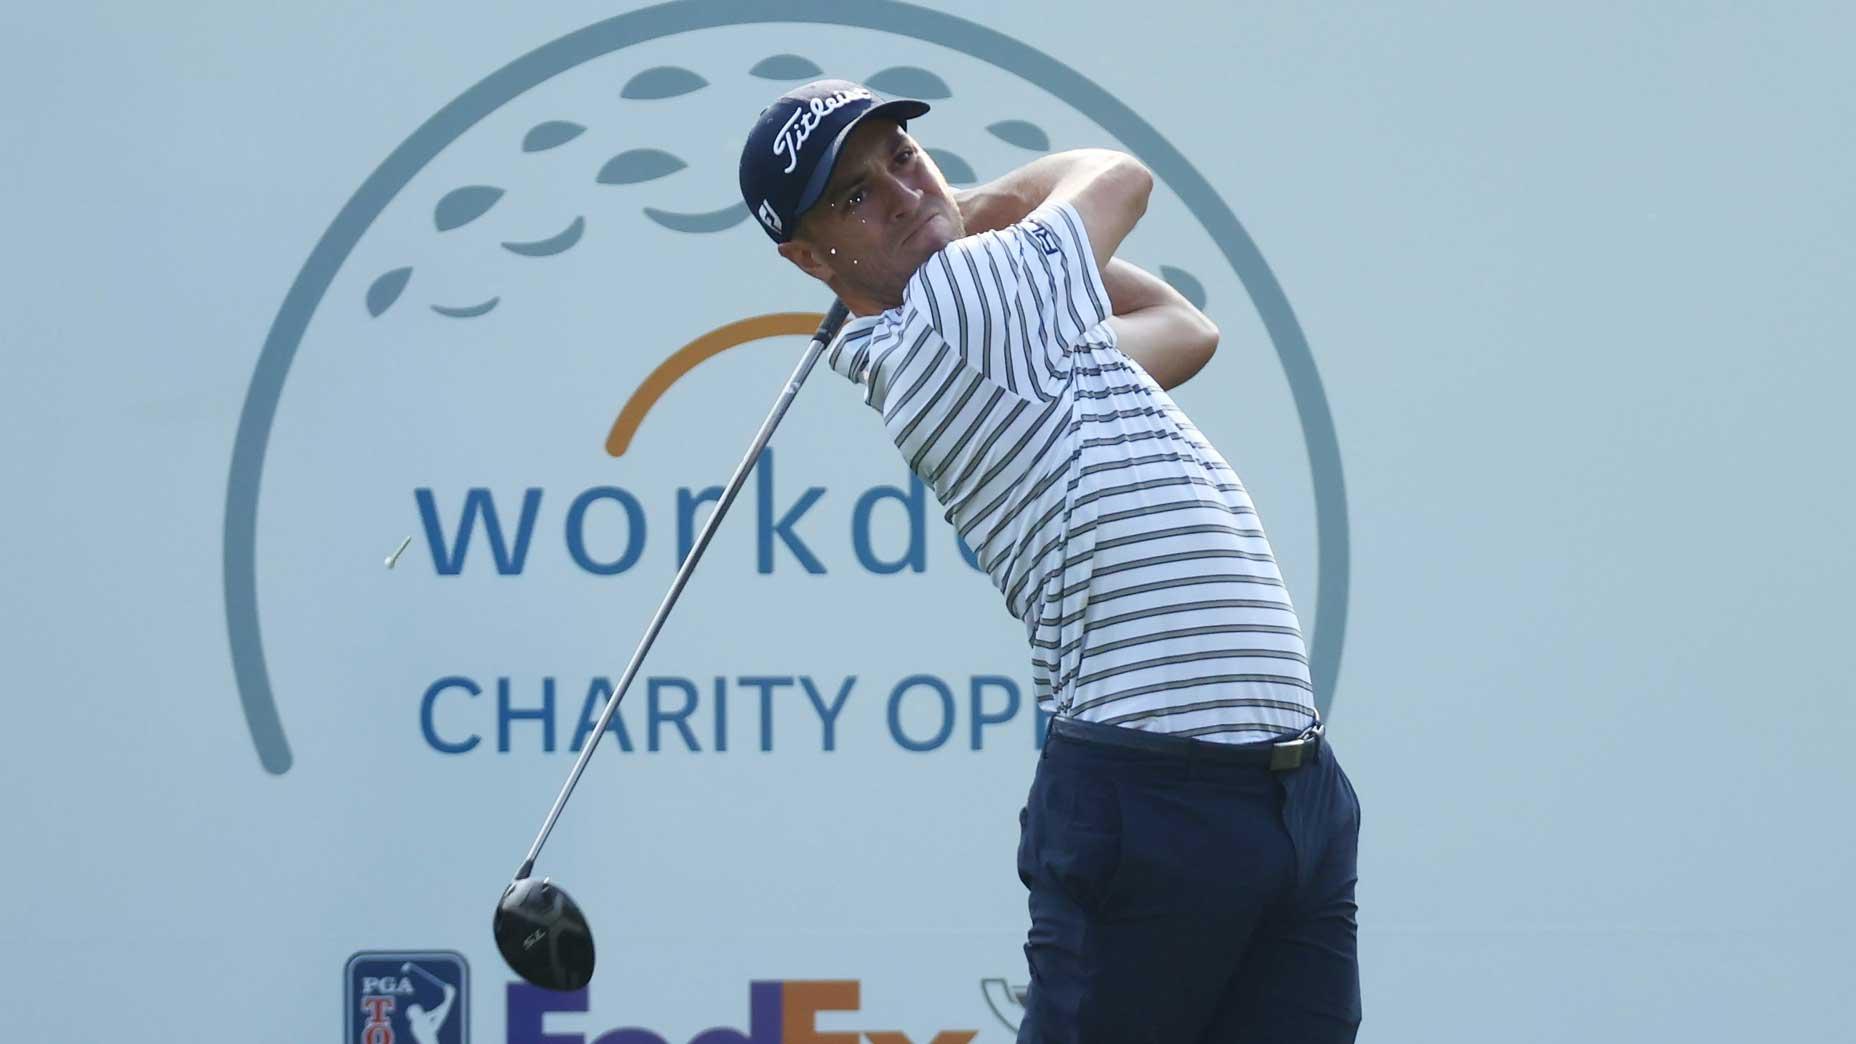 Pro golfer Justin Thomas hits drive